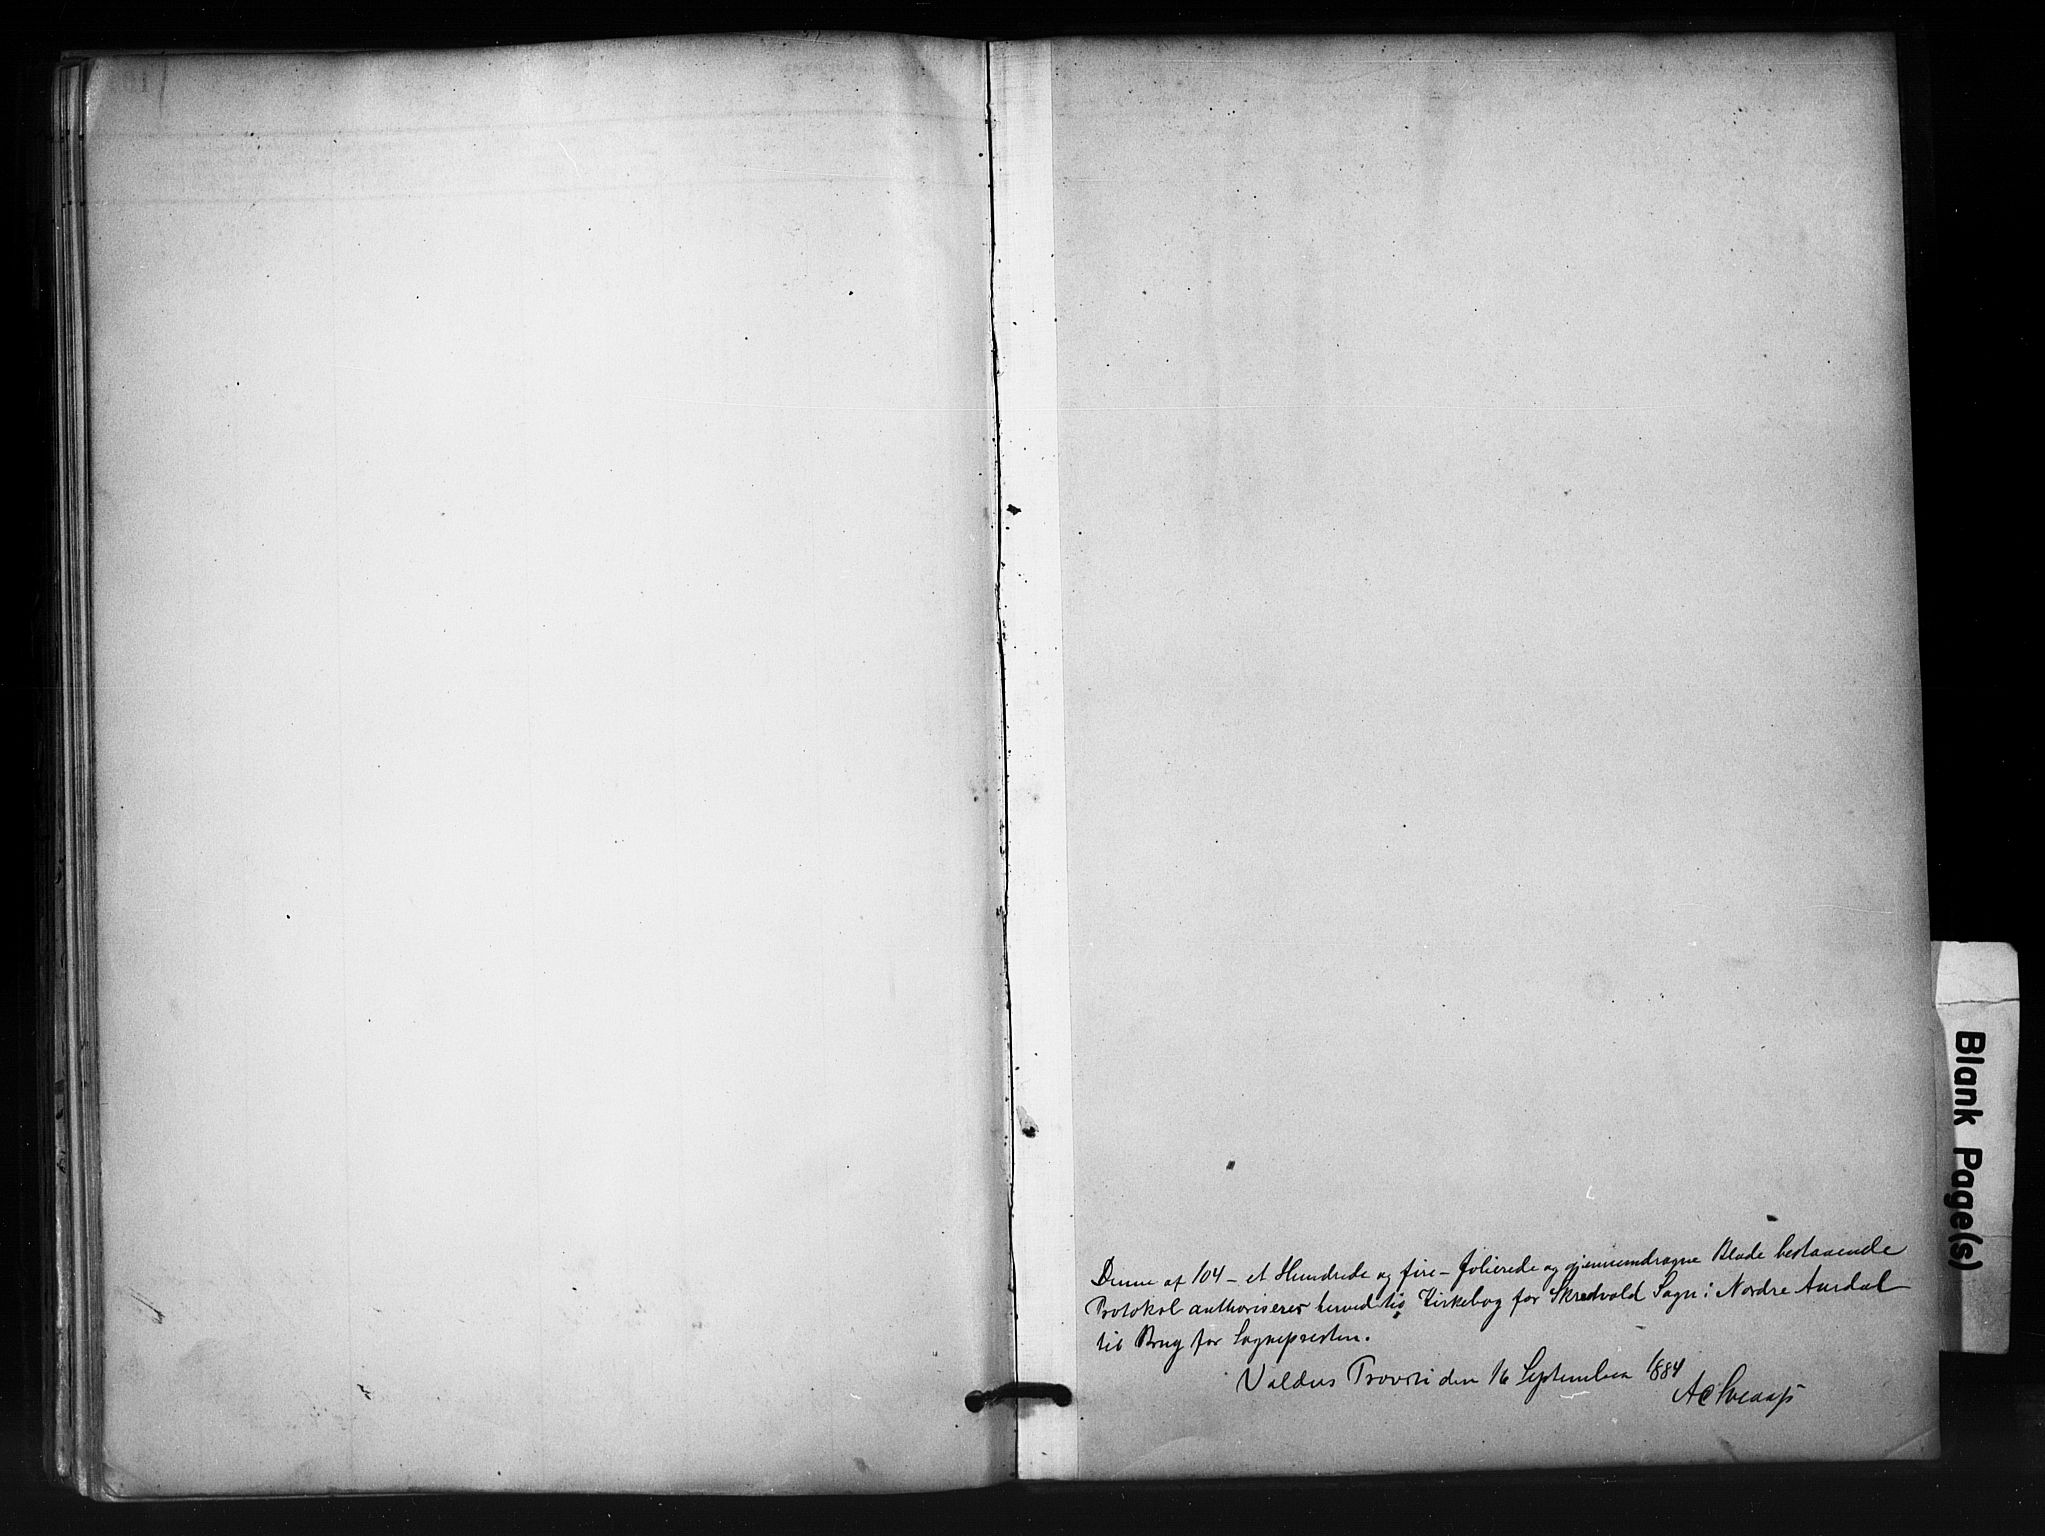 SAH, Nord-Aurdal prestekontor, Ministerialbok nr. 12, 1883-1895